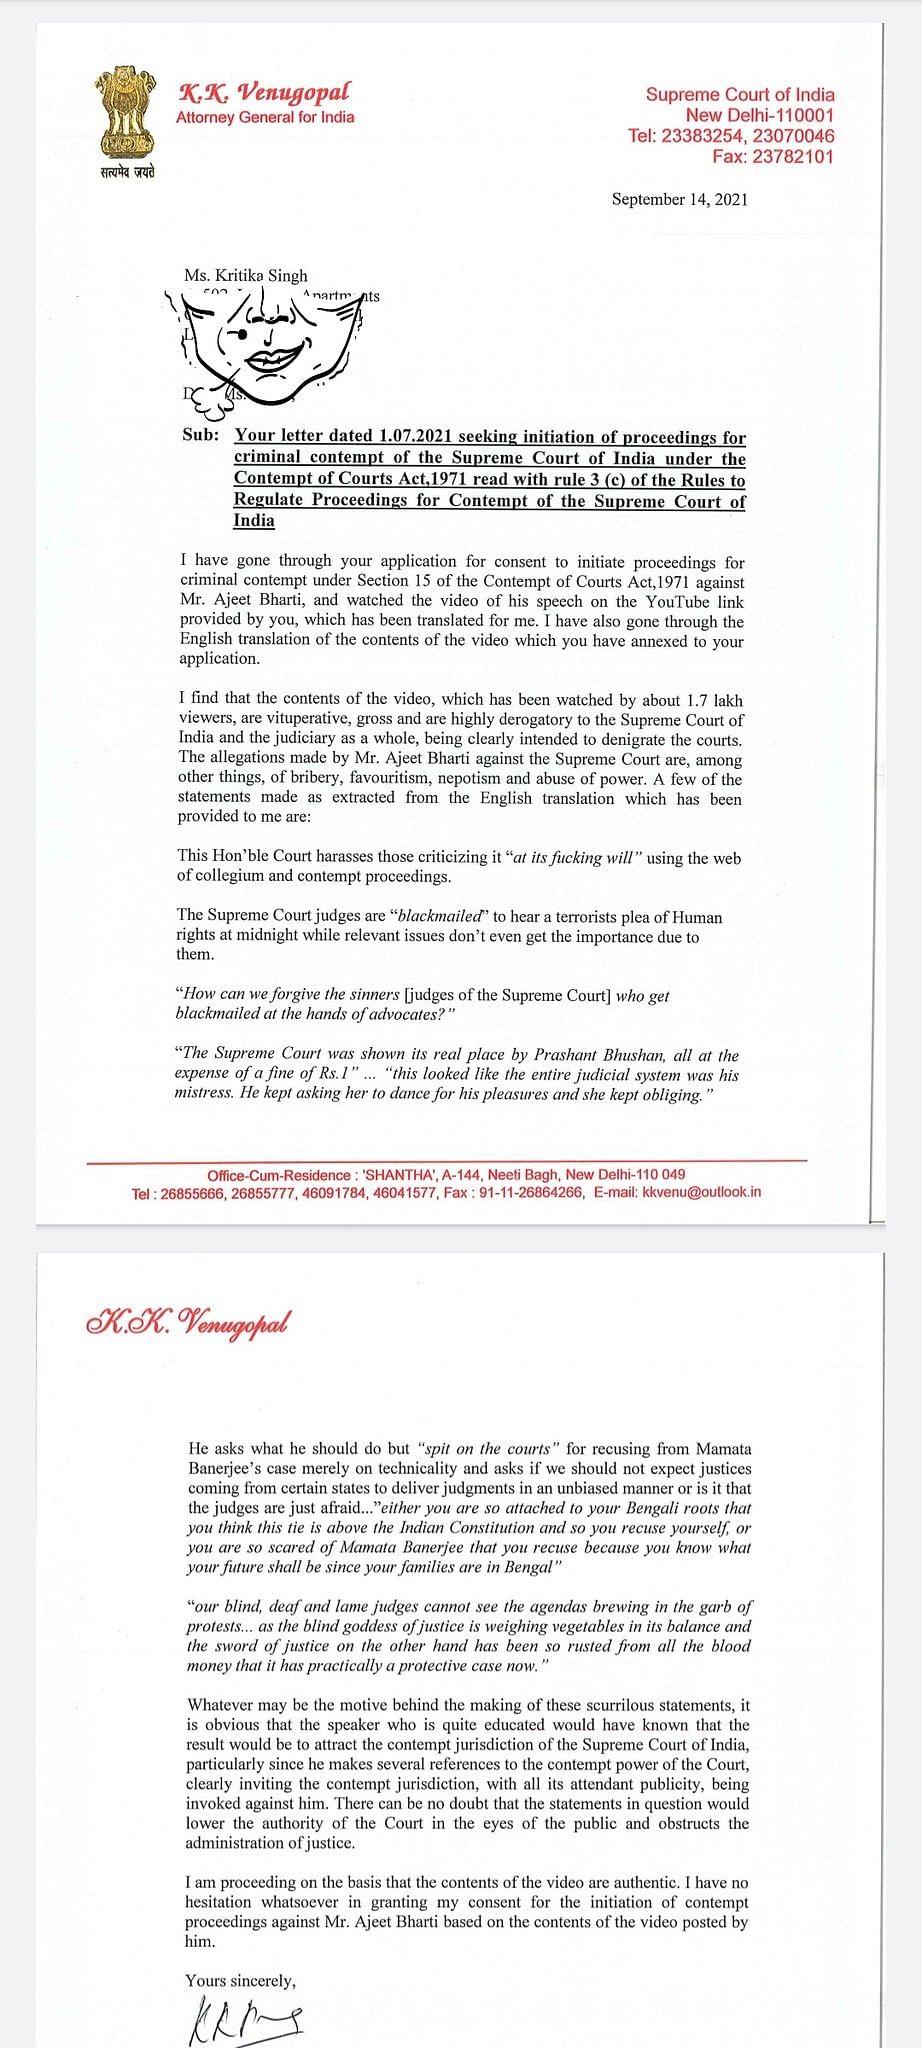 "<div class=""paragraphs""><p>Full text of Attorney General (A-G) KK Venugopal's response.</p></div>"